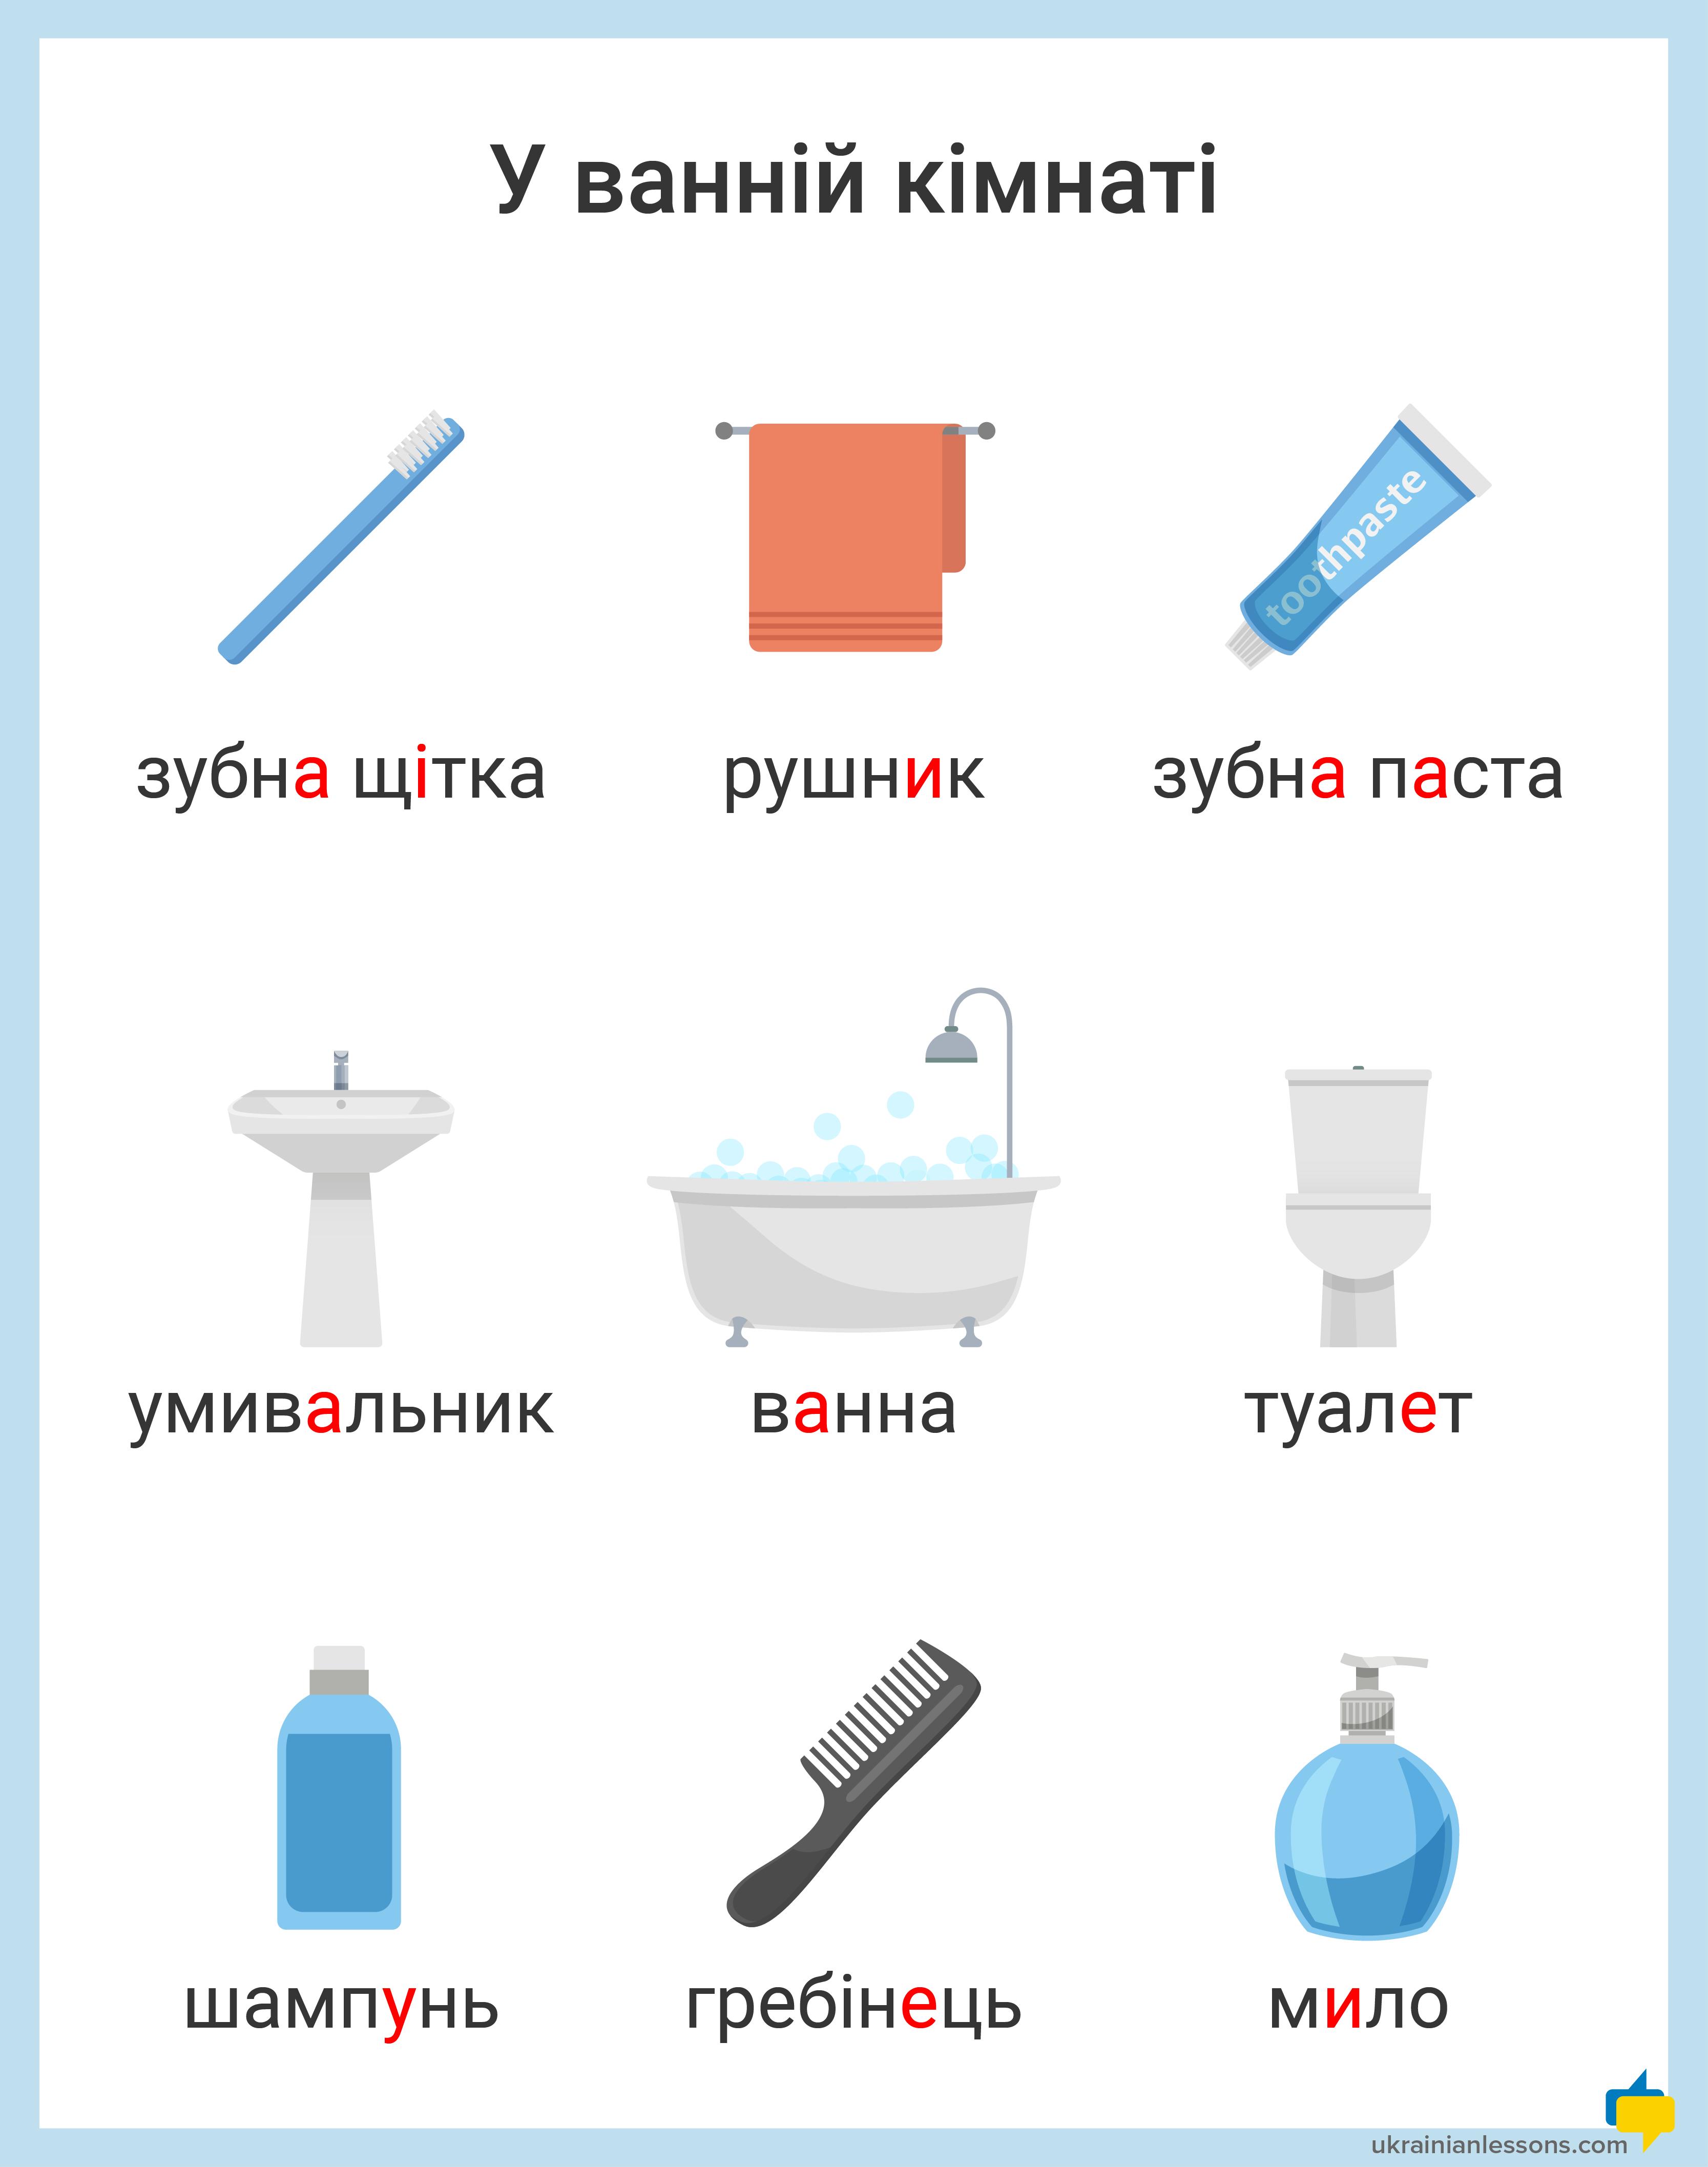 In a bathroom in Ukrainian